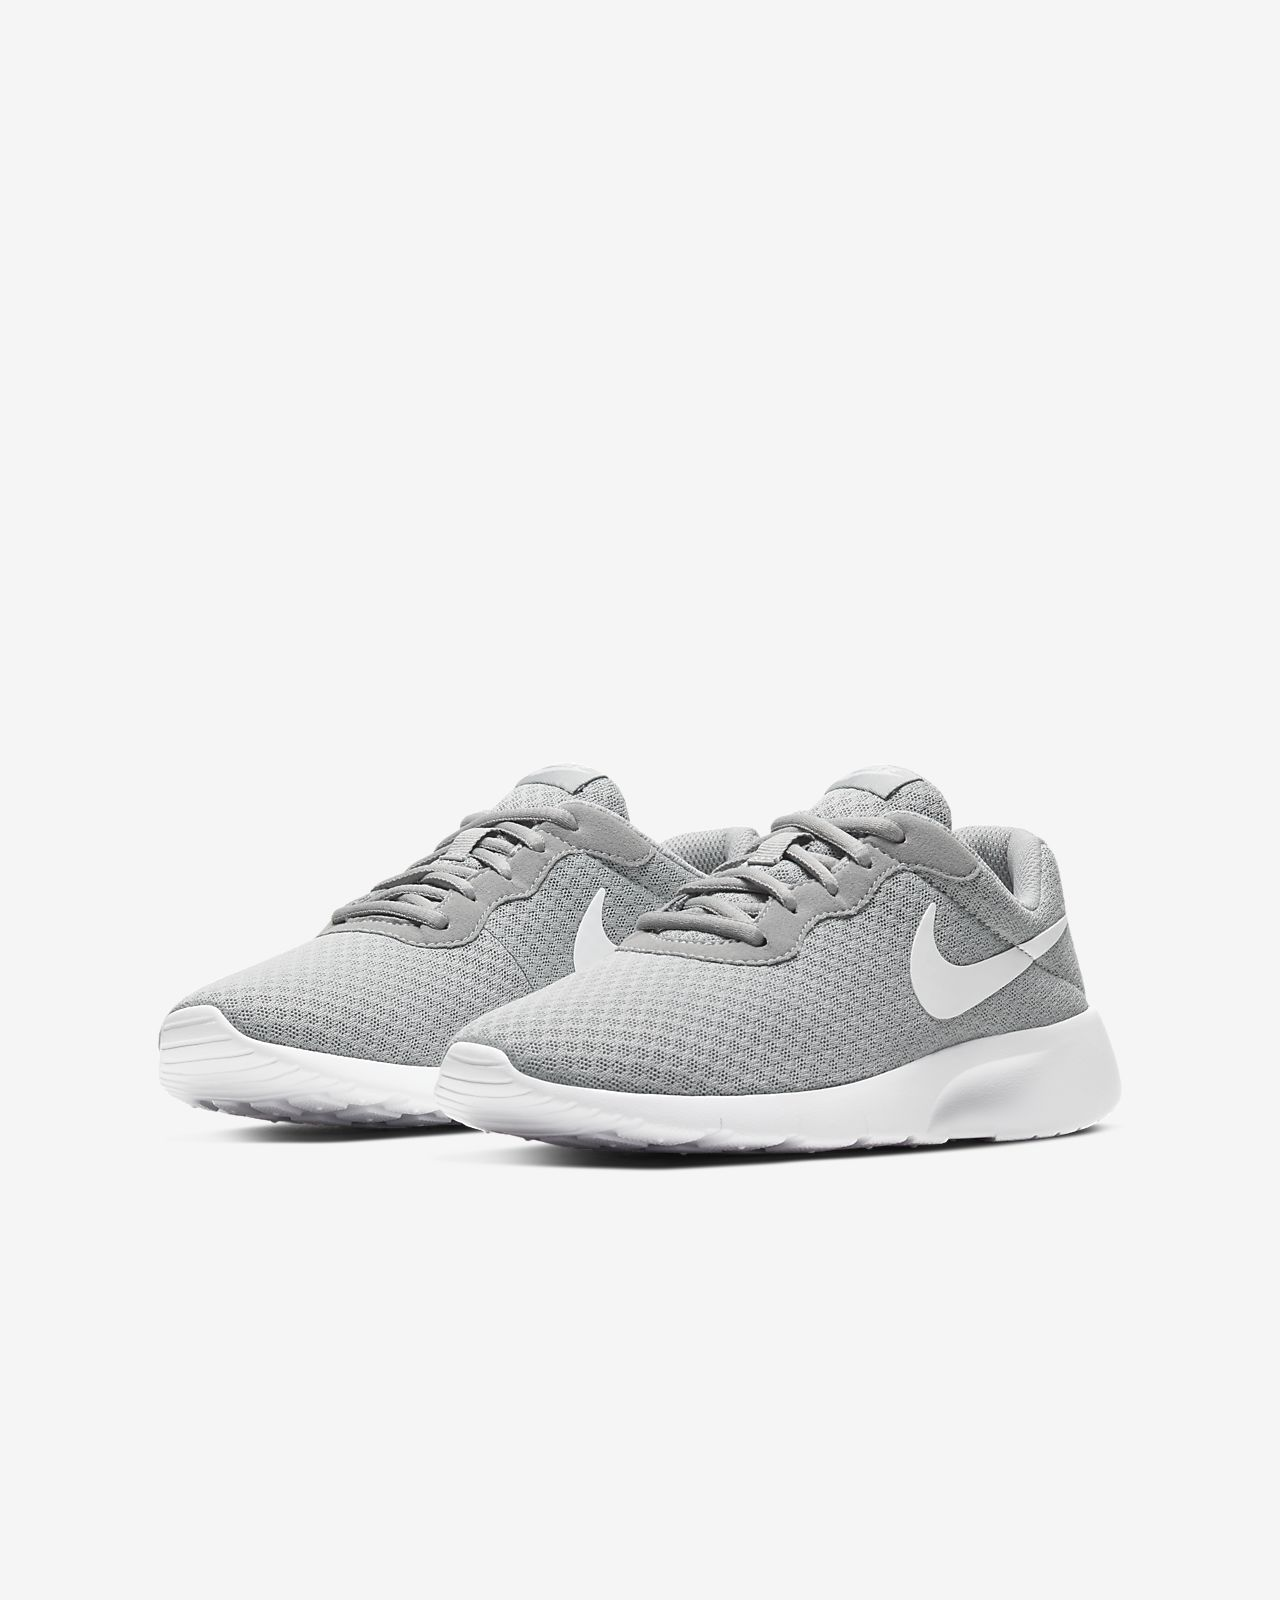 BARGAIN $$$ Nike Tanjun GS Kids Running Shoes 001